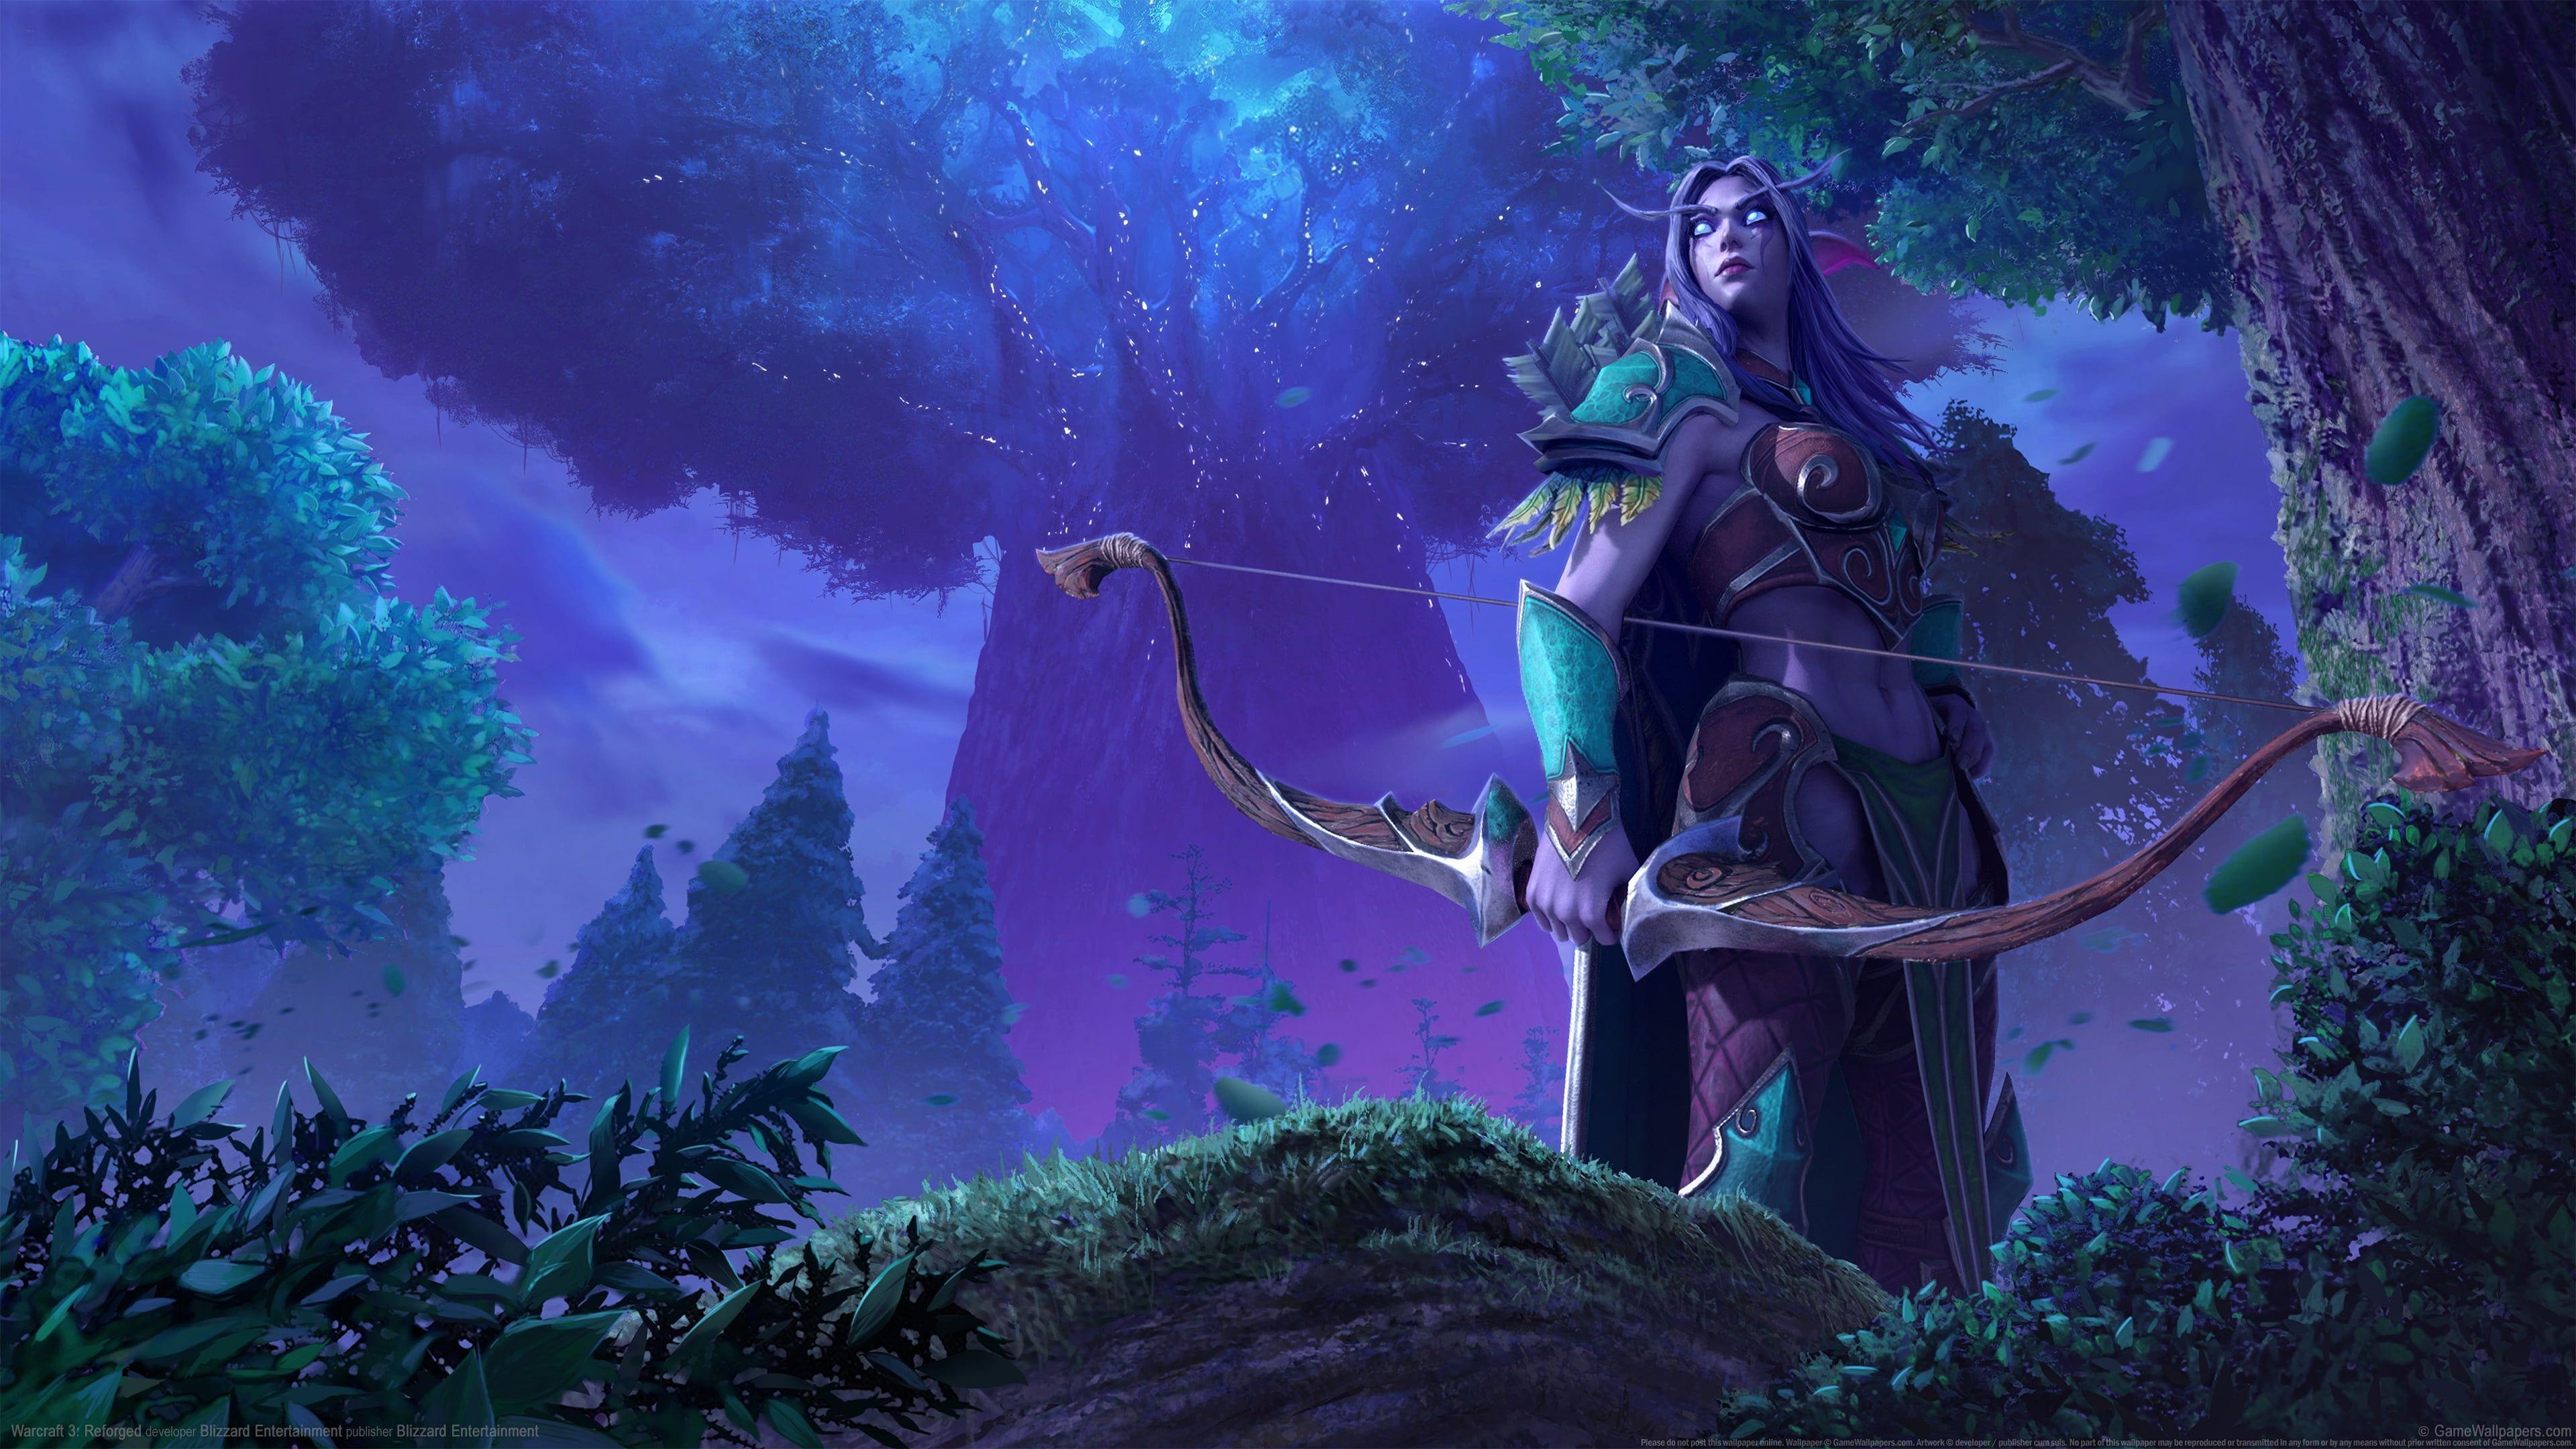 Warcraft Iii Warcraft Iii Reforged Video Games Video Game Art Digital Art Elves Night Elves Sylvanas Windru In 2020 World Of Warcraft Wallpaper Warcraft Iii Warcraft